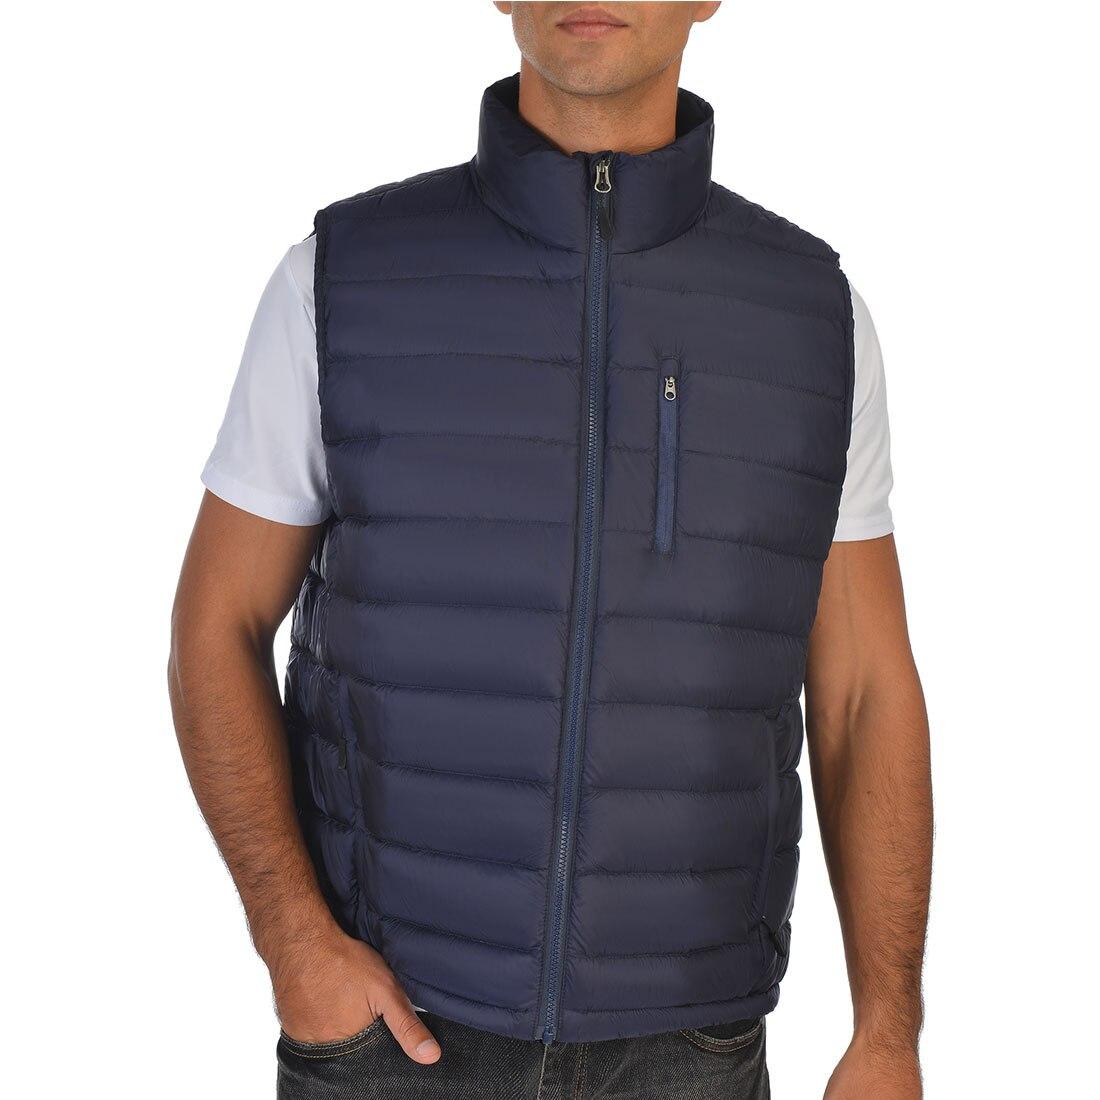 Winter Men Duck Down Vest Lesmart Light Puffer Jacket Sleeveless Coats Warm Gilet Autumn Windproof Duck Down Waistcoat